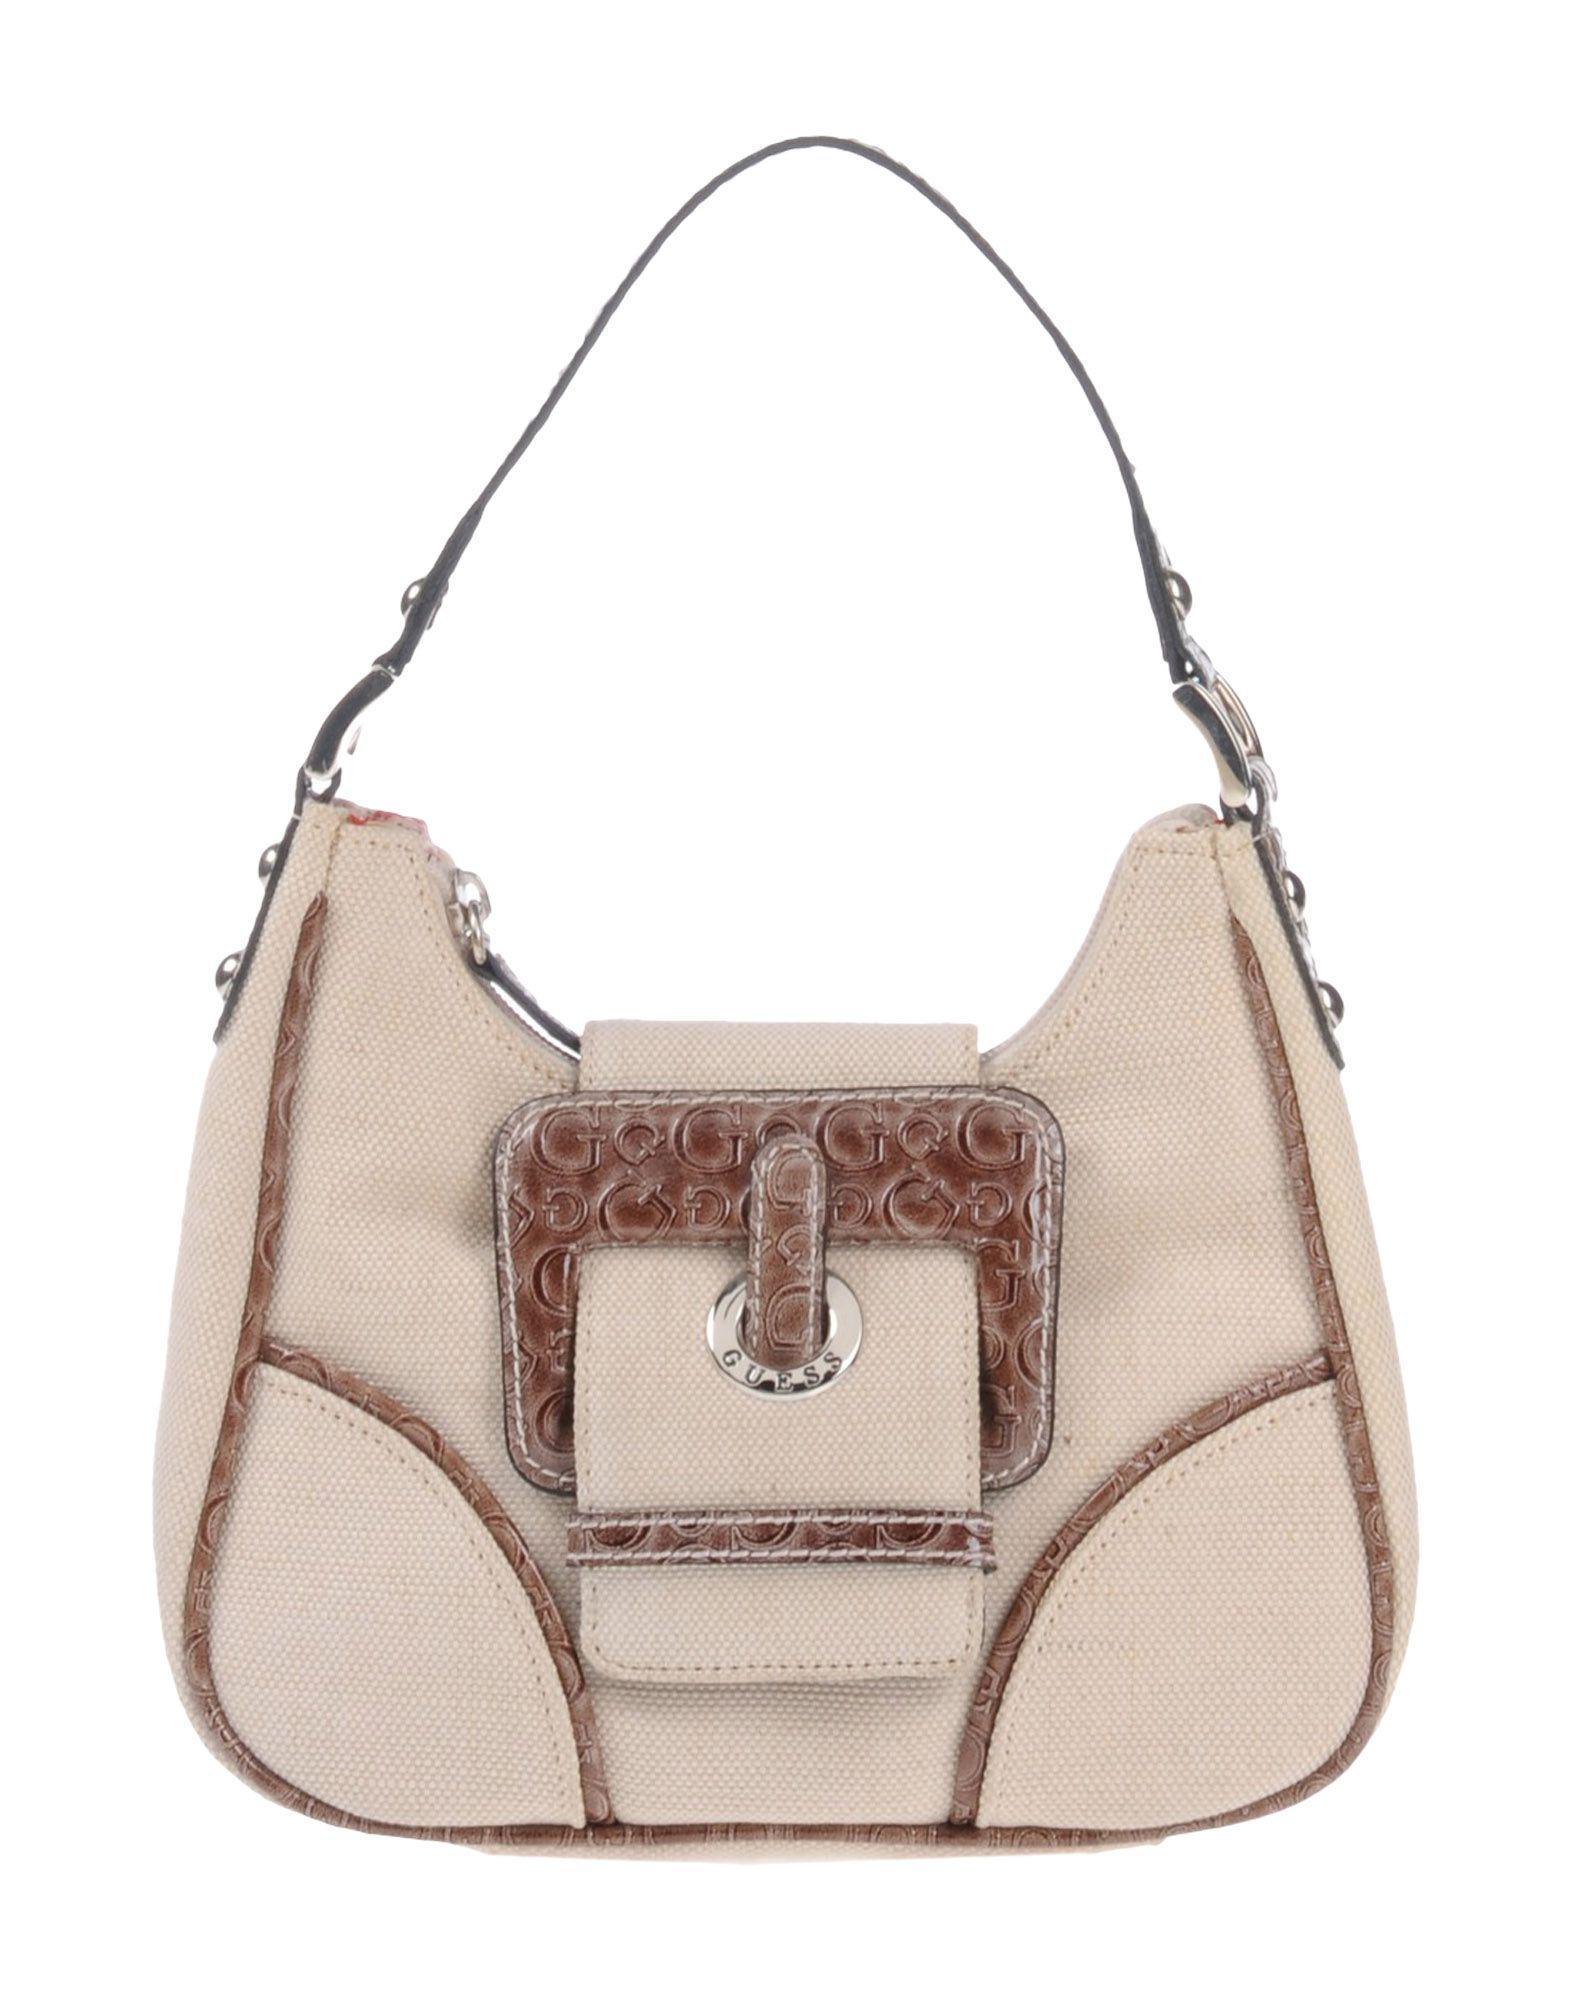 2c460de62e59 Guess Handbag in White - Lyst